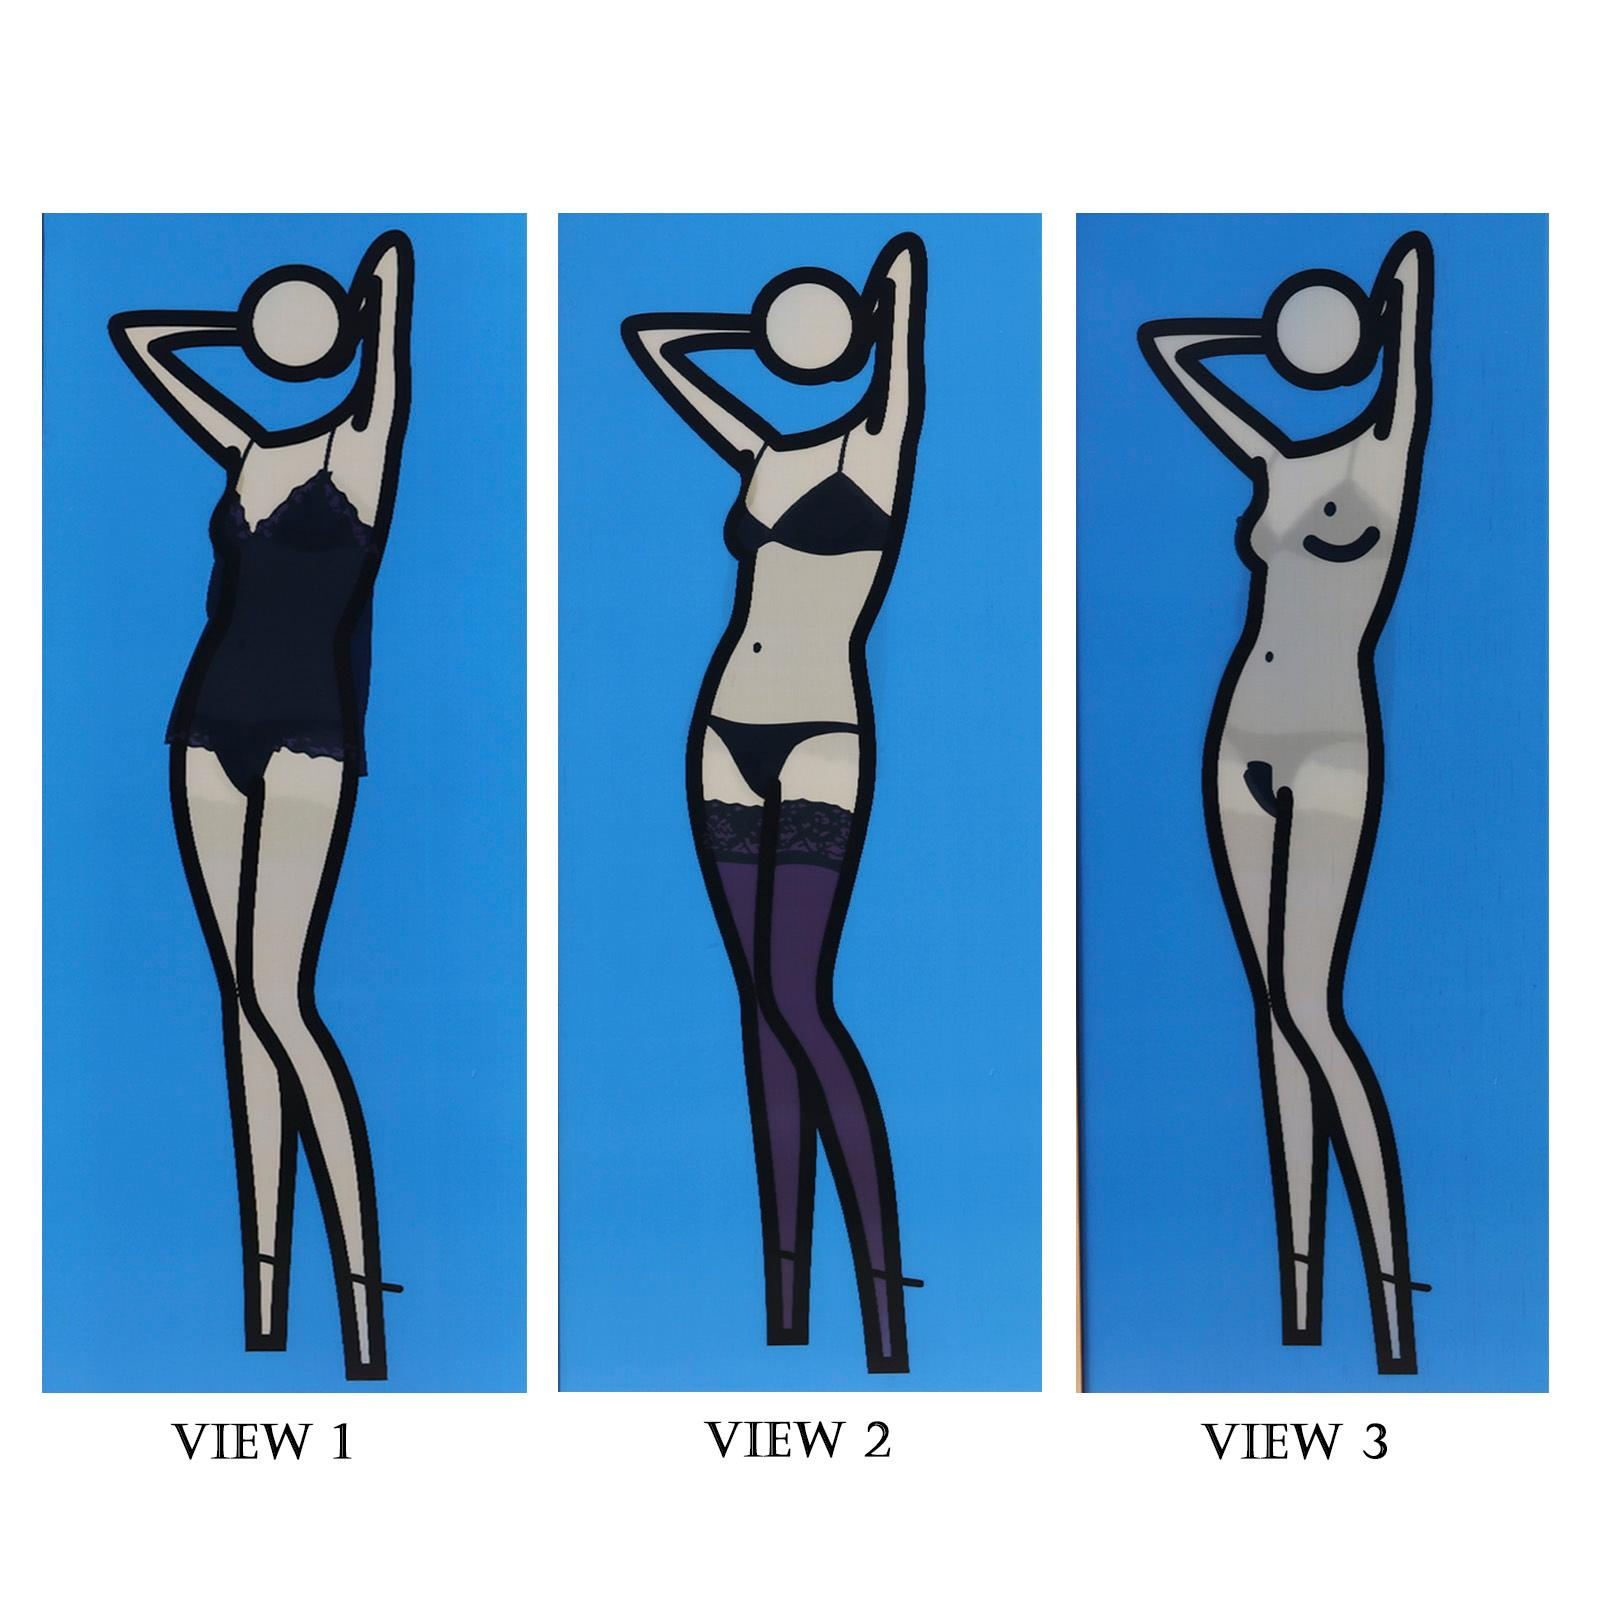 "Julian Opie, (British, b.1958), Sara Gets Undressed 2, 2004, lenticular acrylic panel comprised of inkjet prints, 76""H x 31 1/2""W (image), 78 1/2""H x 34""W (frame)."